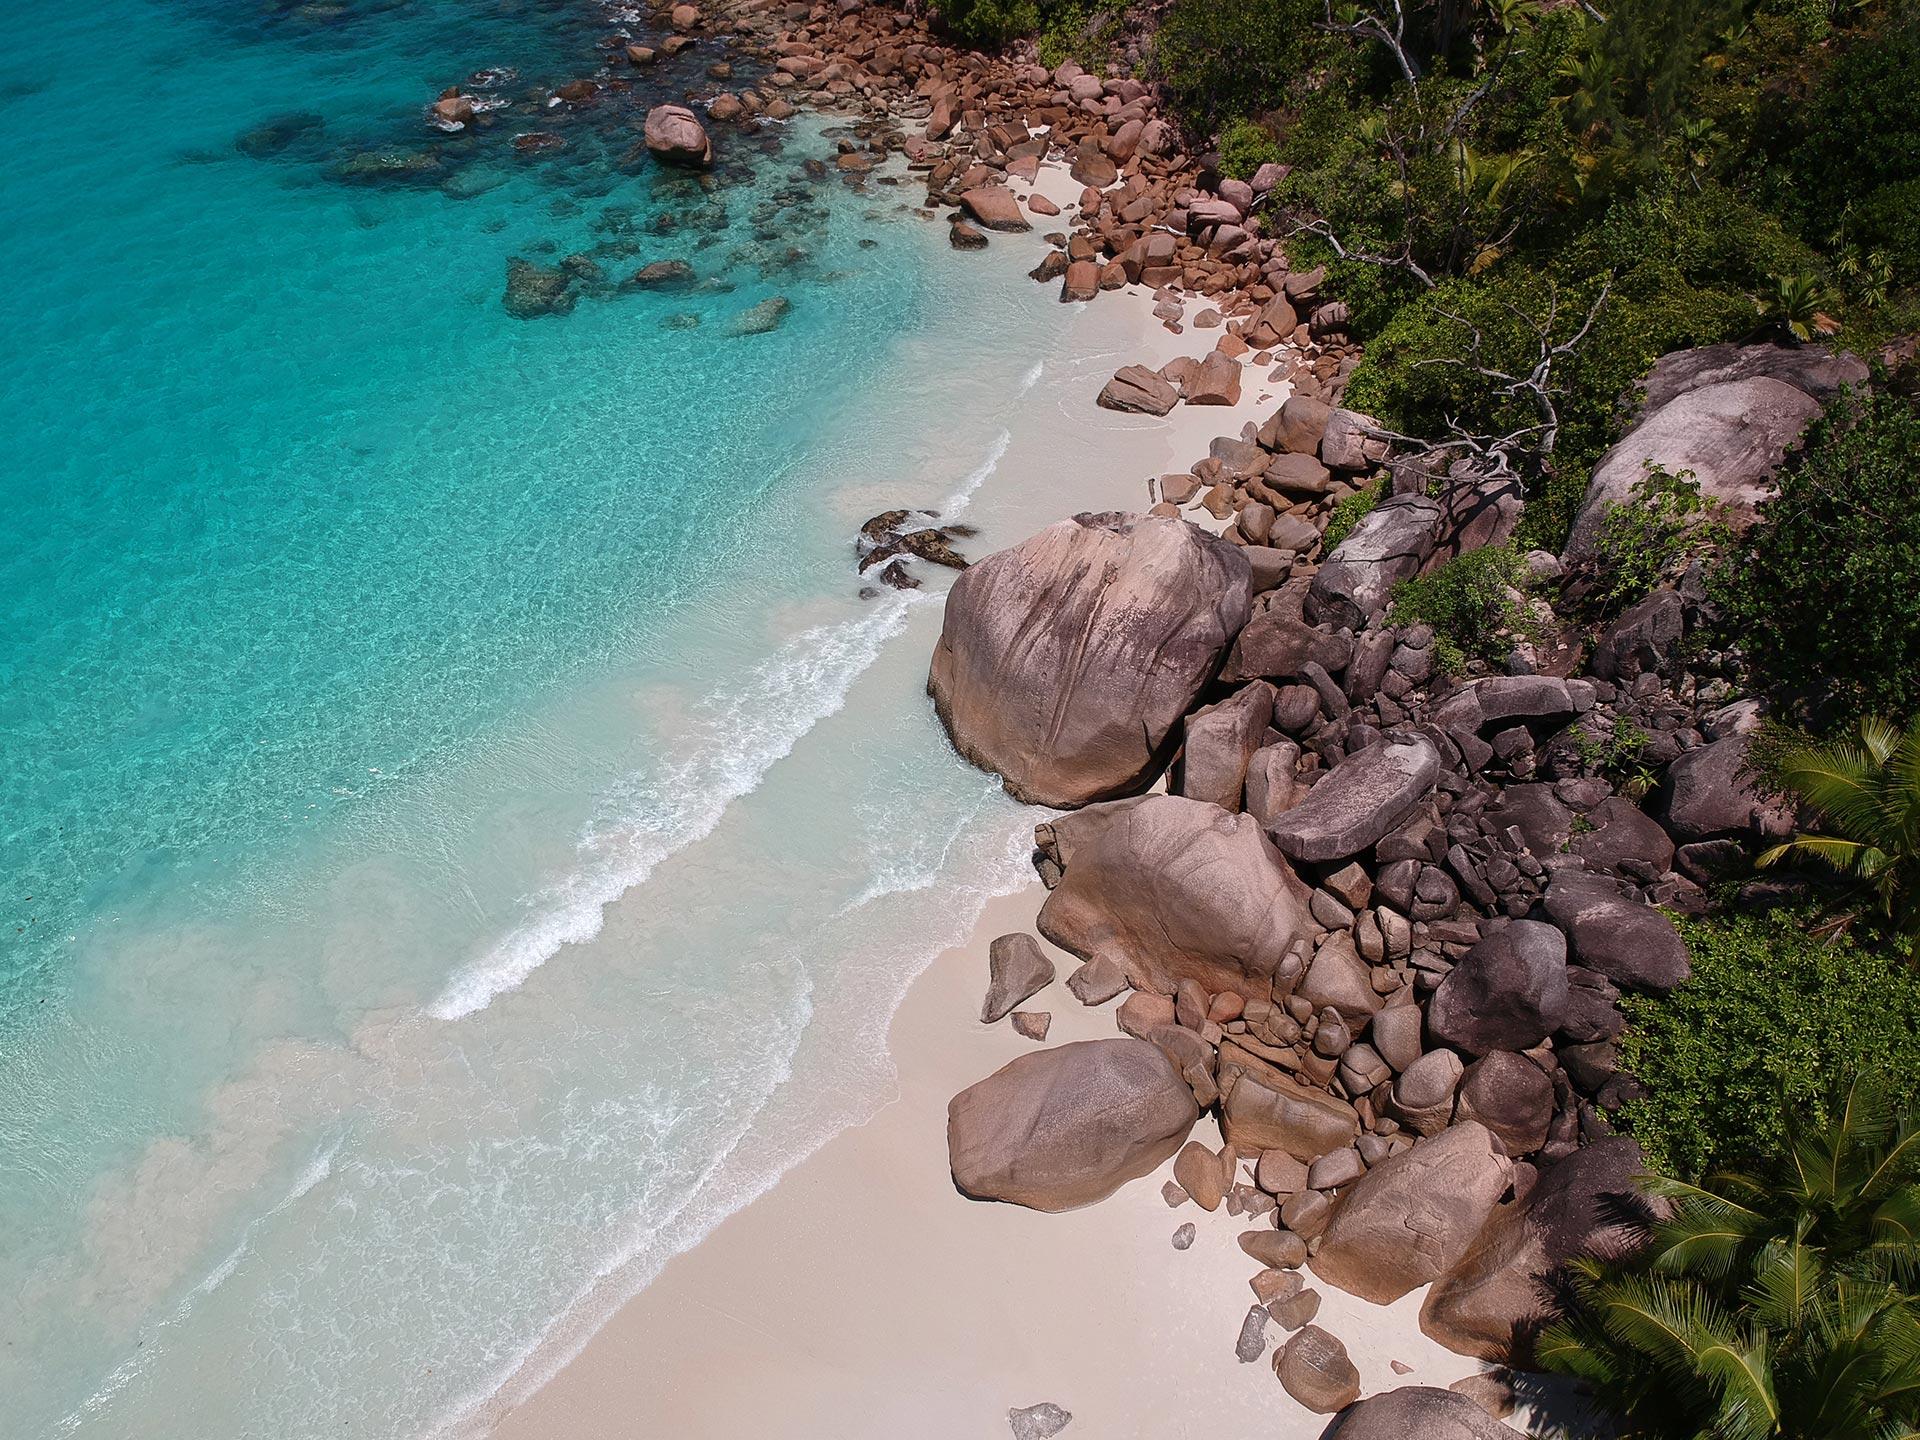 Desroces Island